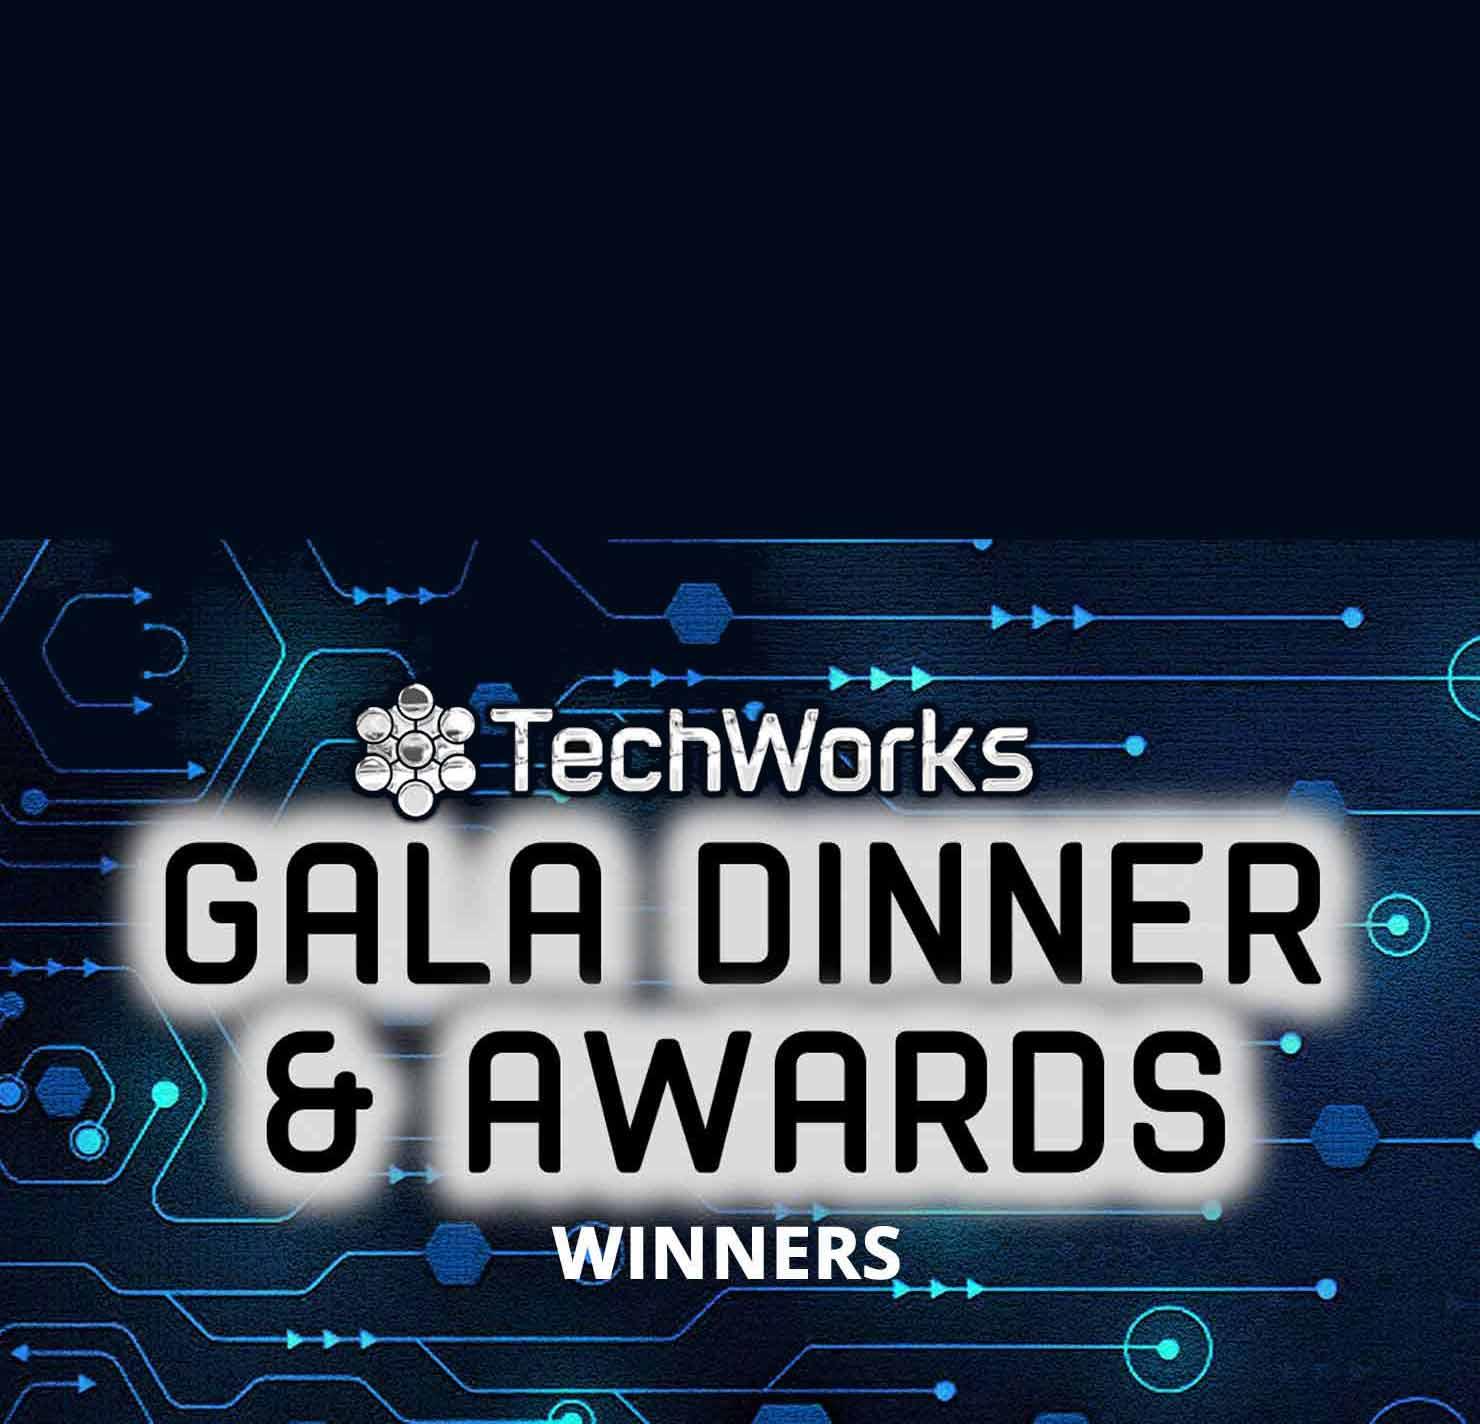 TechWorks Awards and Gala Dinner